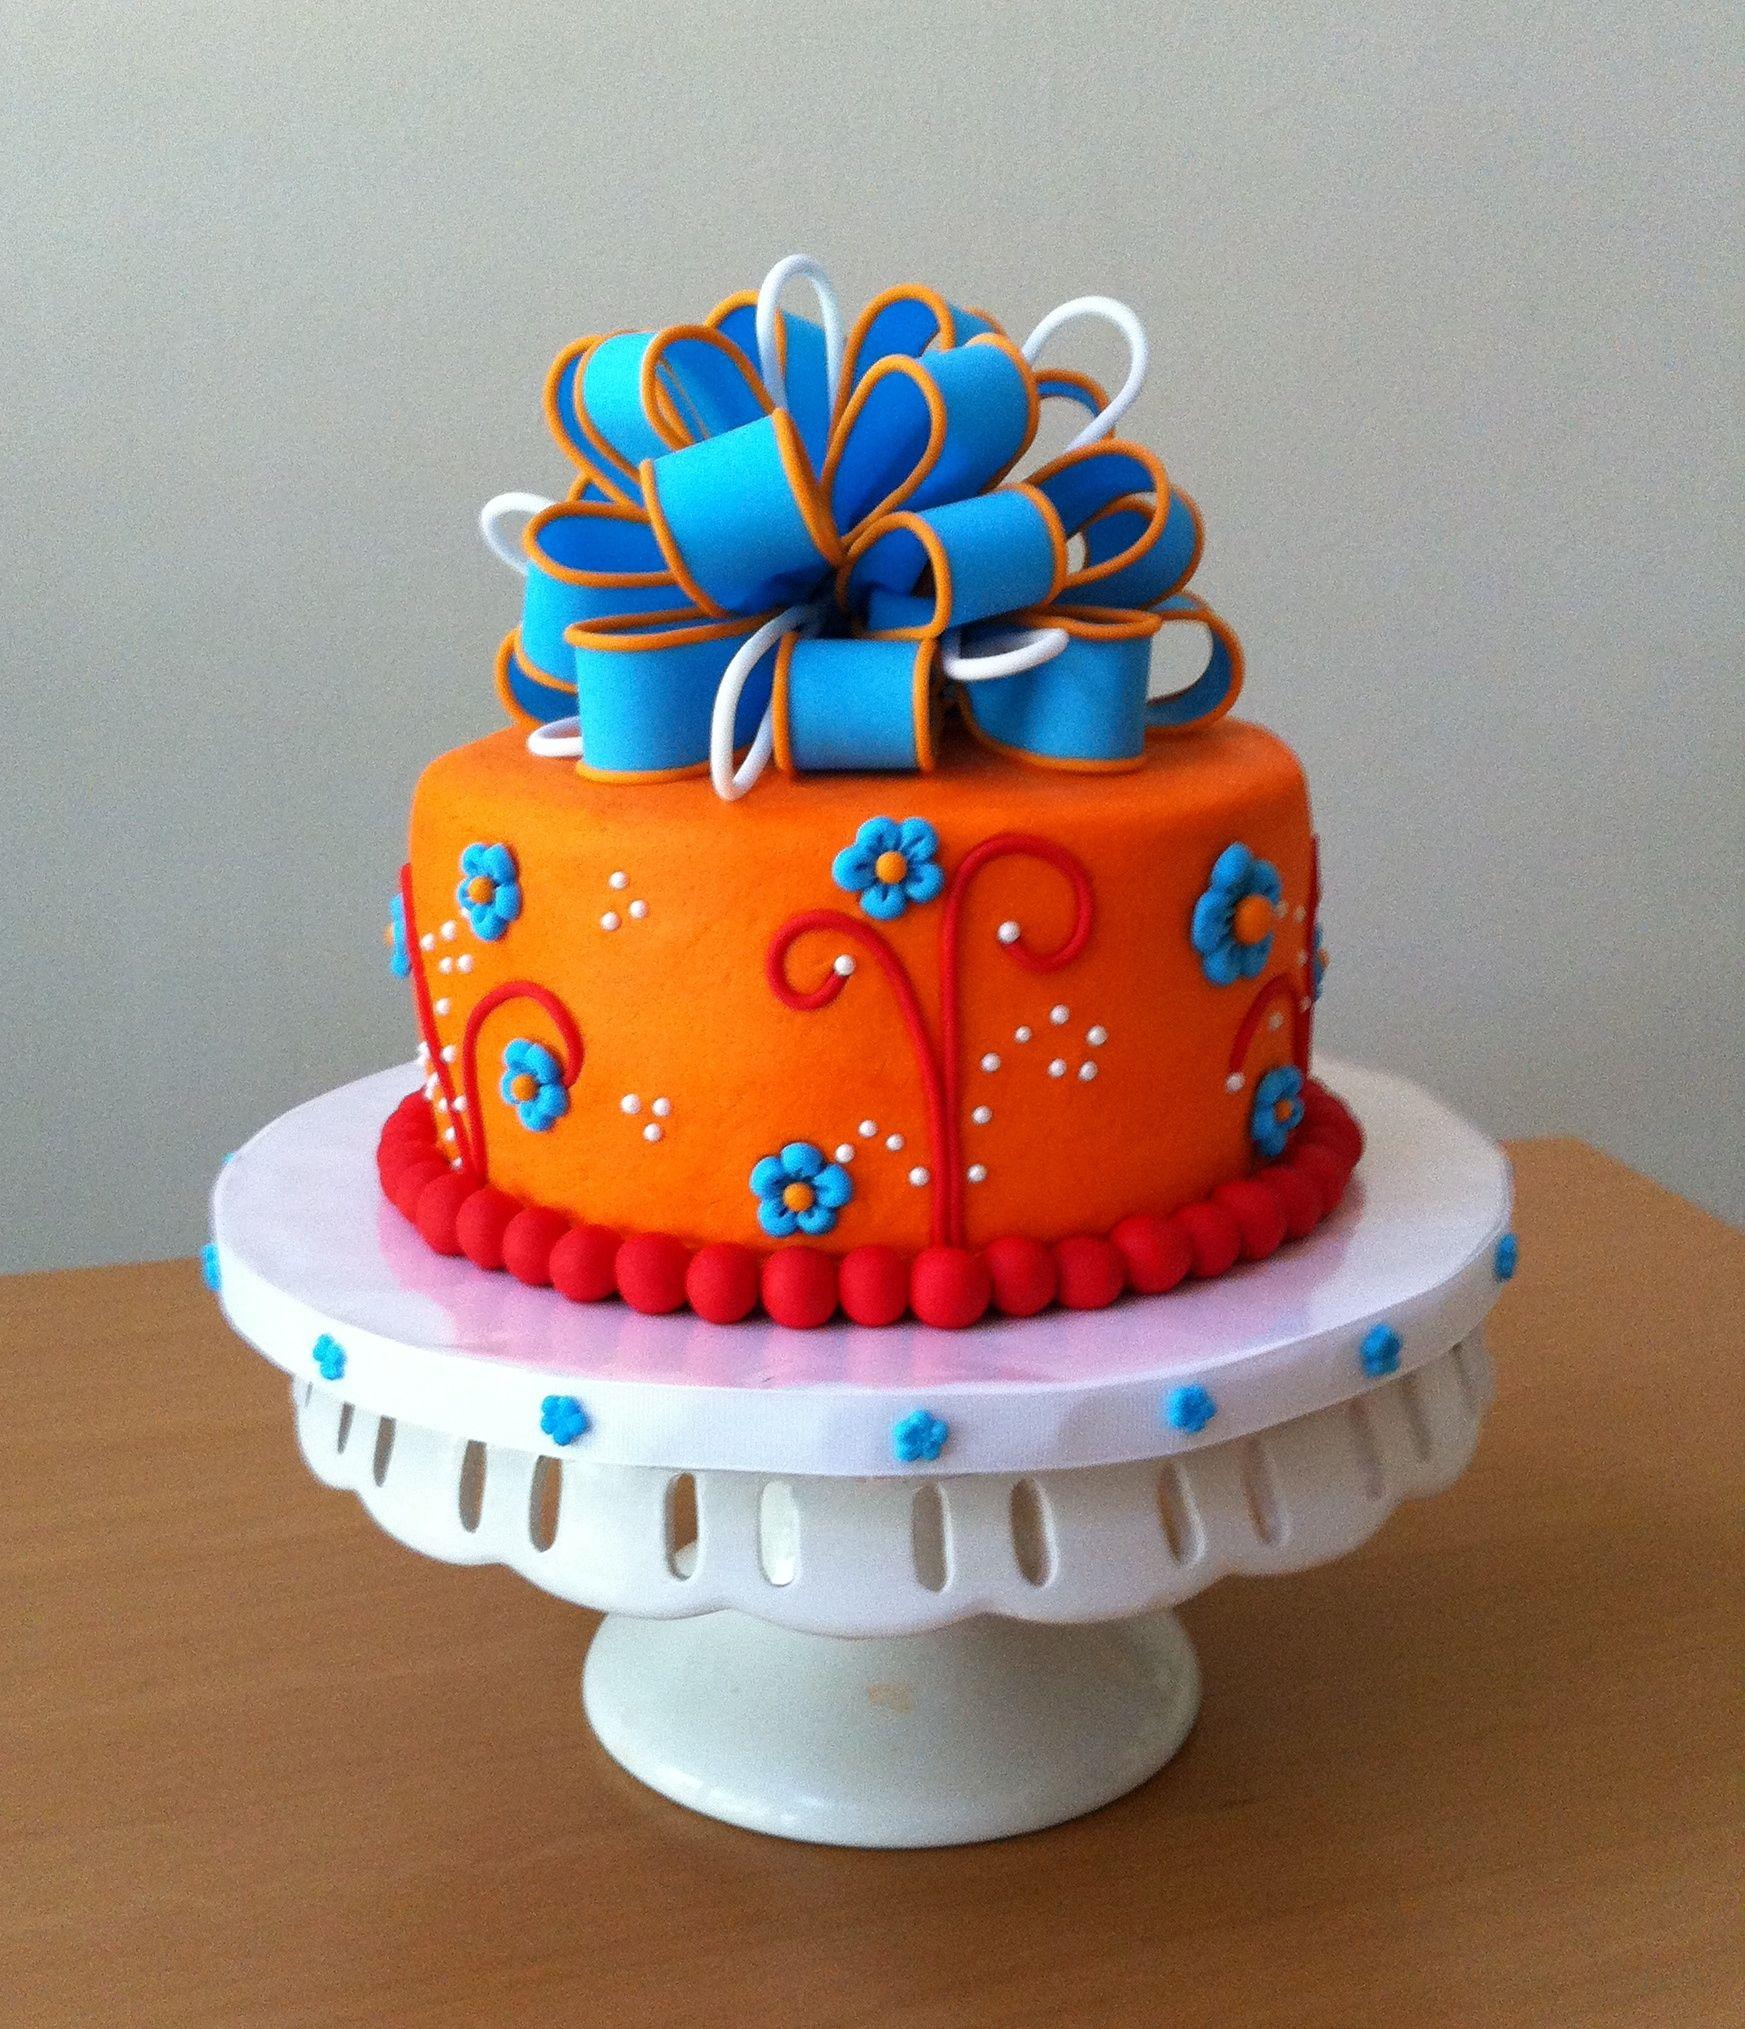 Brilliant Orange And Blue Birthday Cake Blue Birthday Cakes Orange Funny Birthday Cards Online Hetedamsfinfo